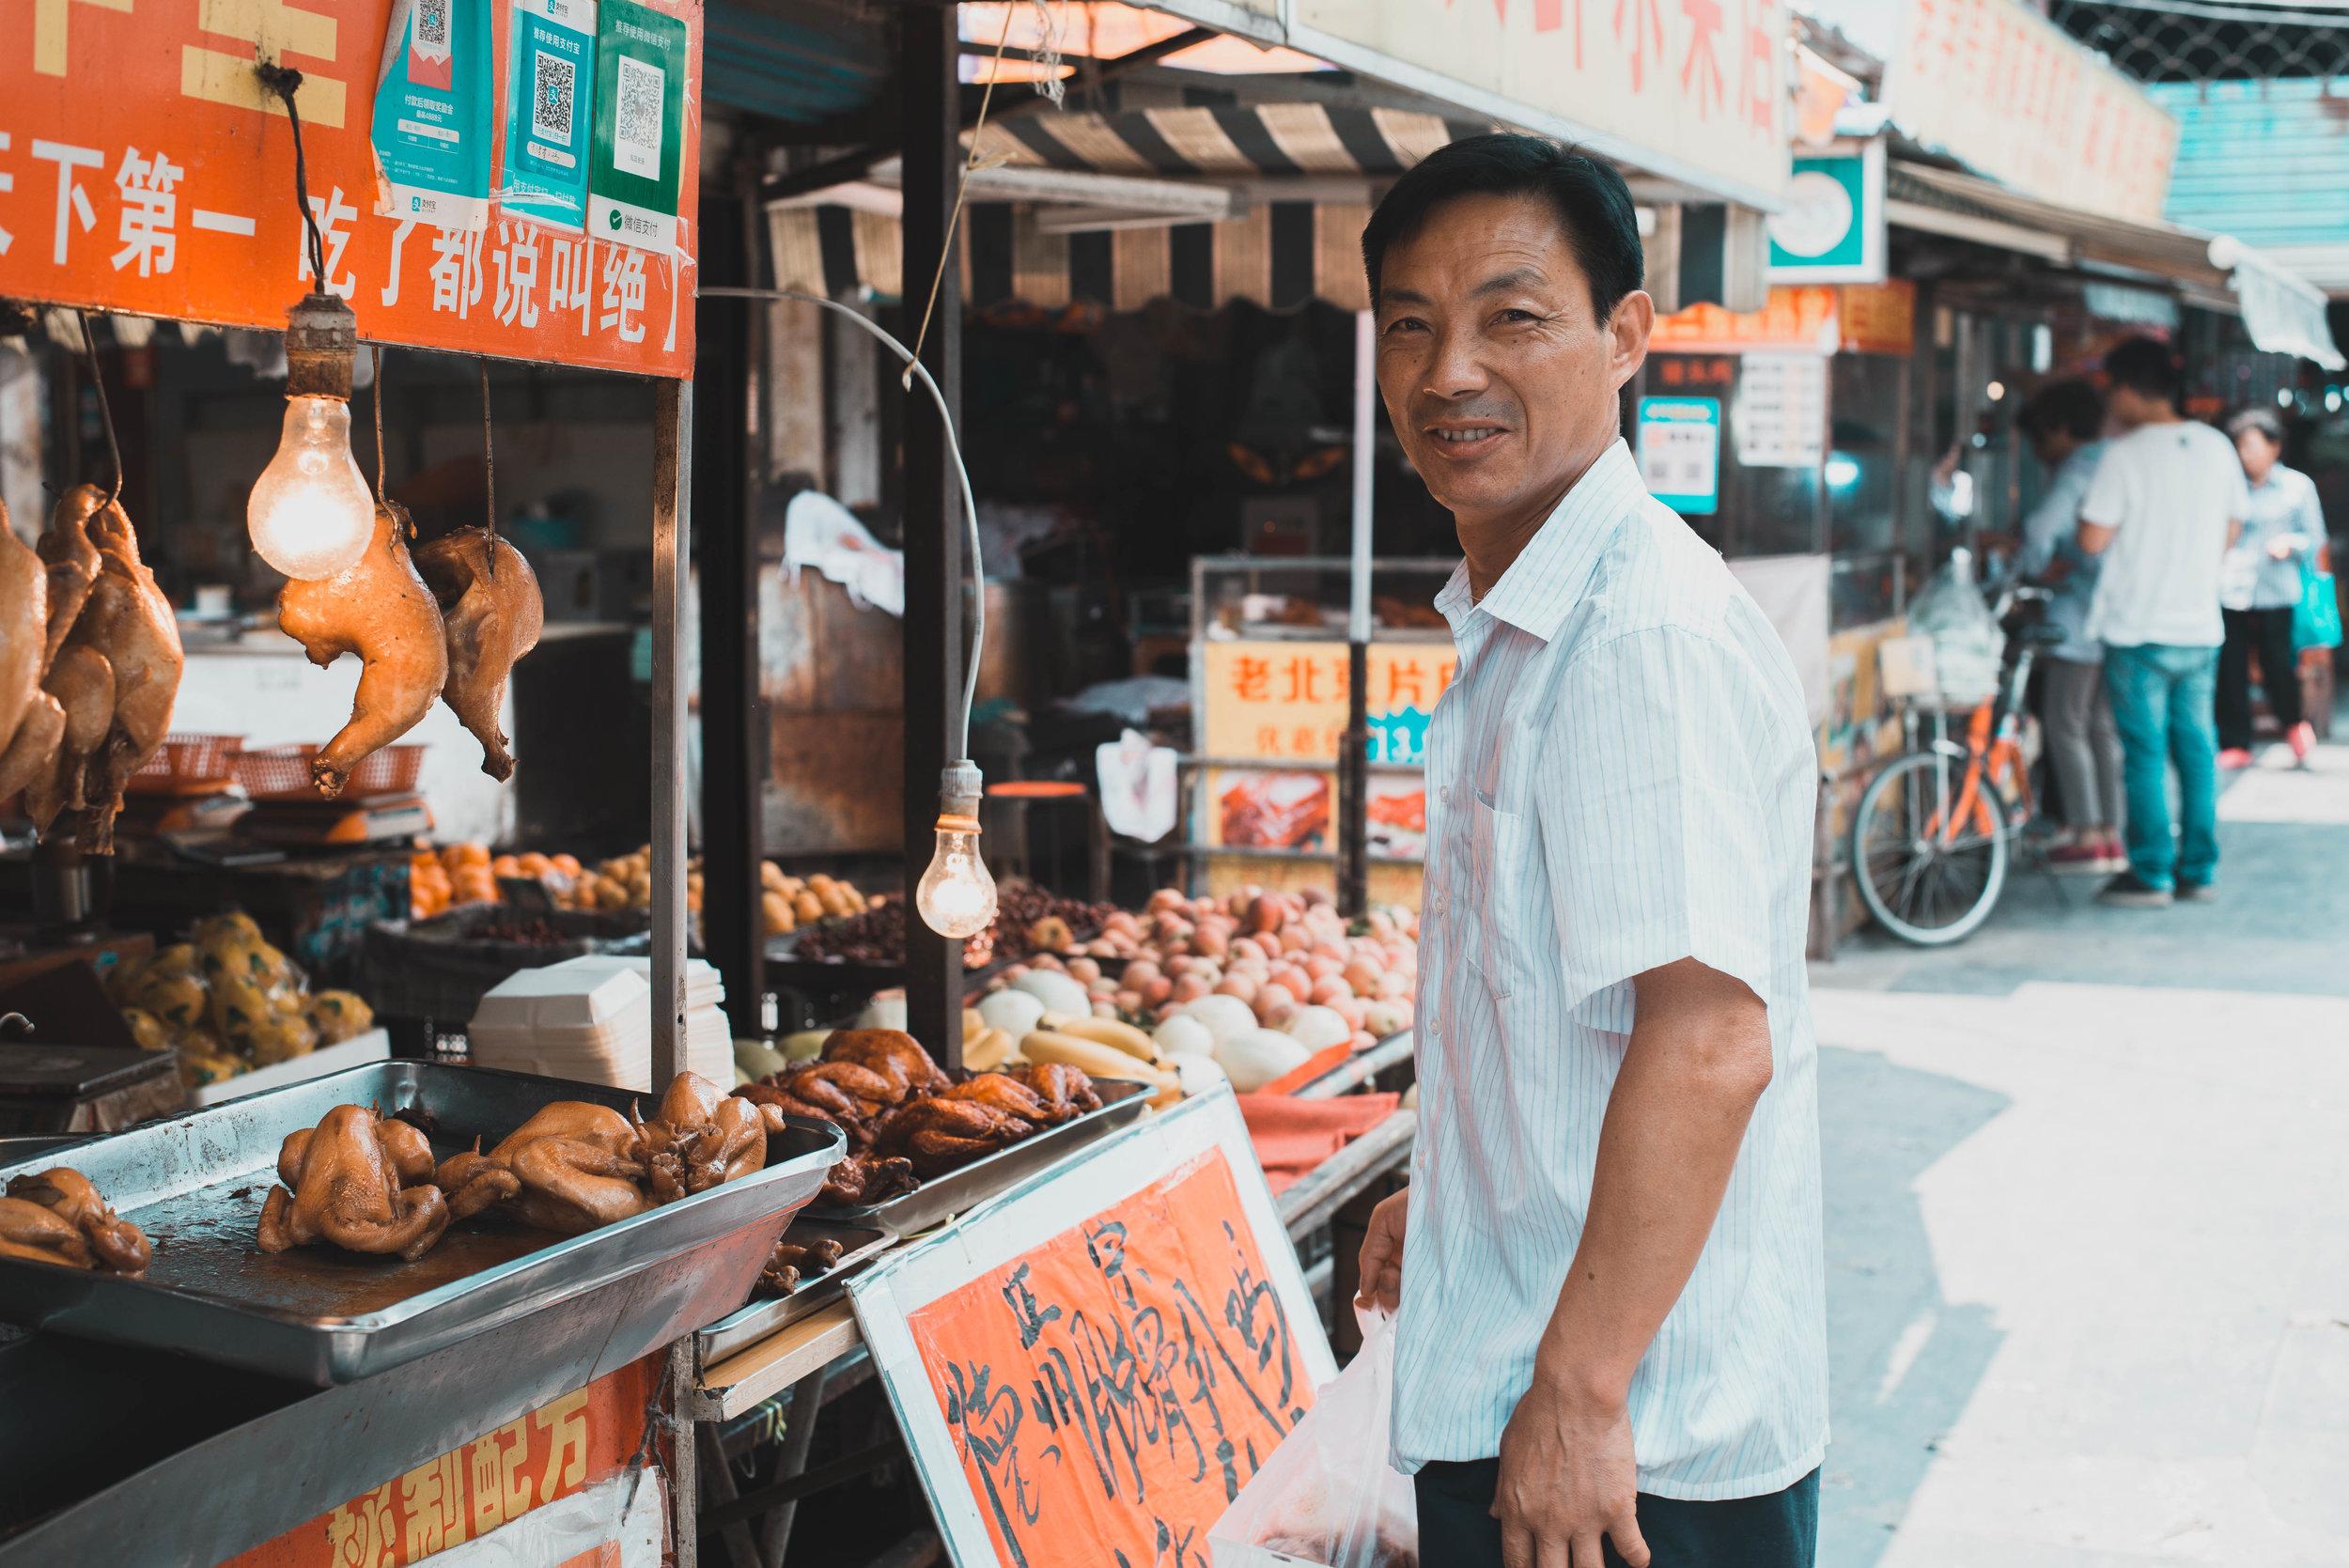 A Nanjing local doing his daily shopping at a Nanjing street market